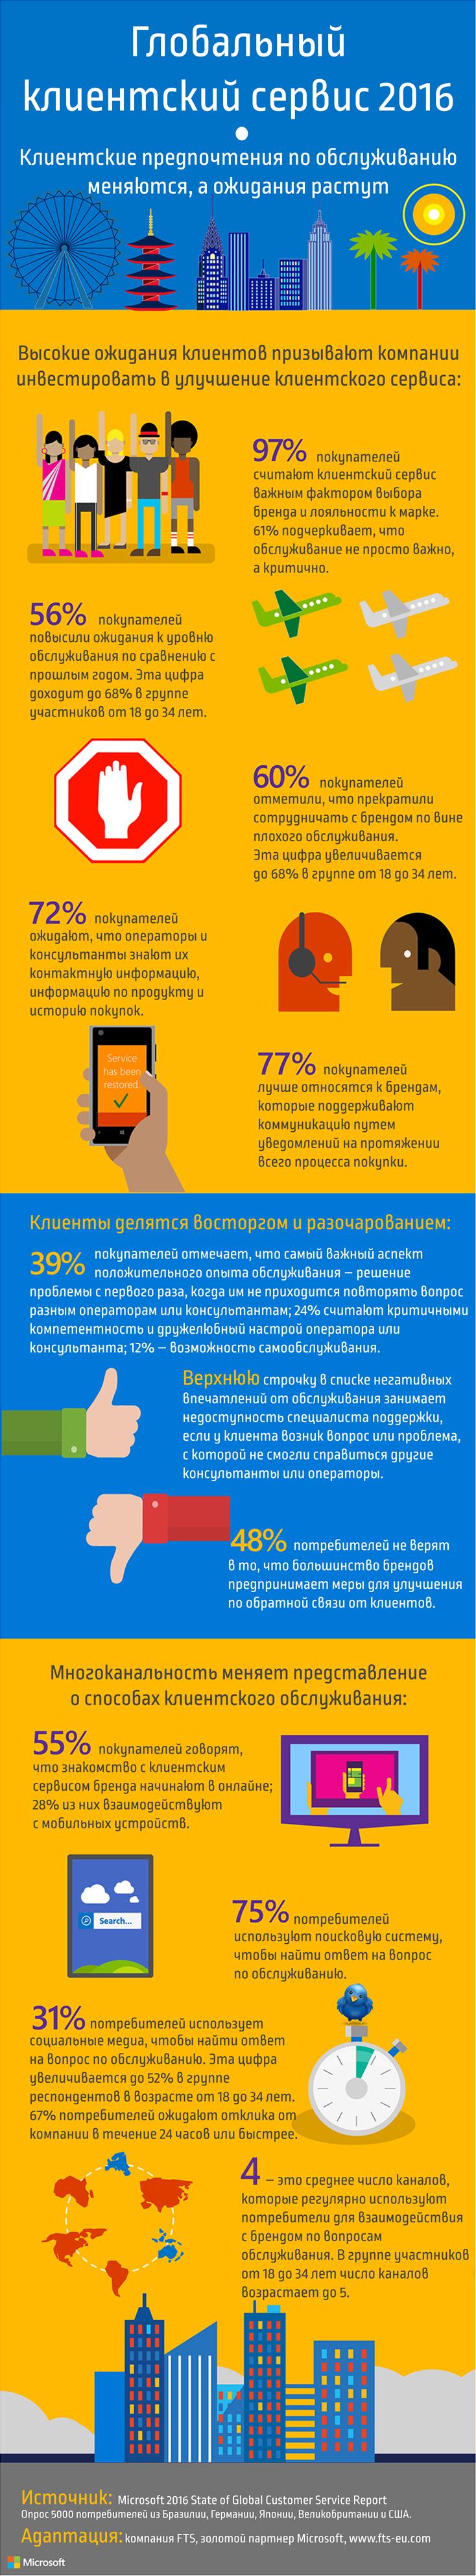 2016_Global_Customer_Service_Infographic_RU_1